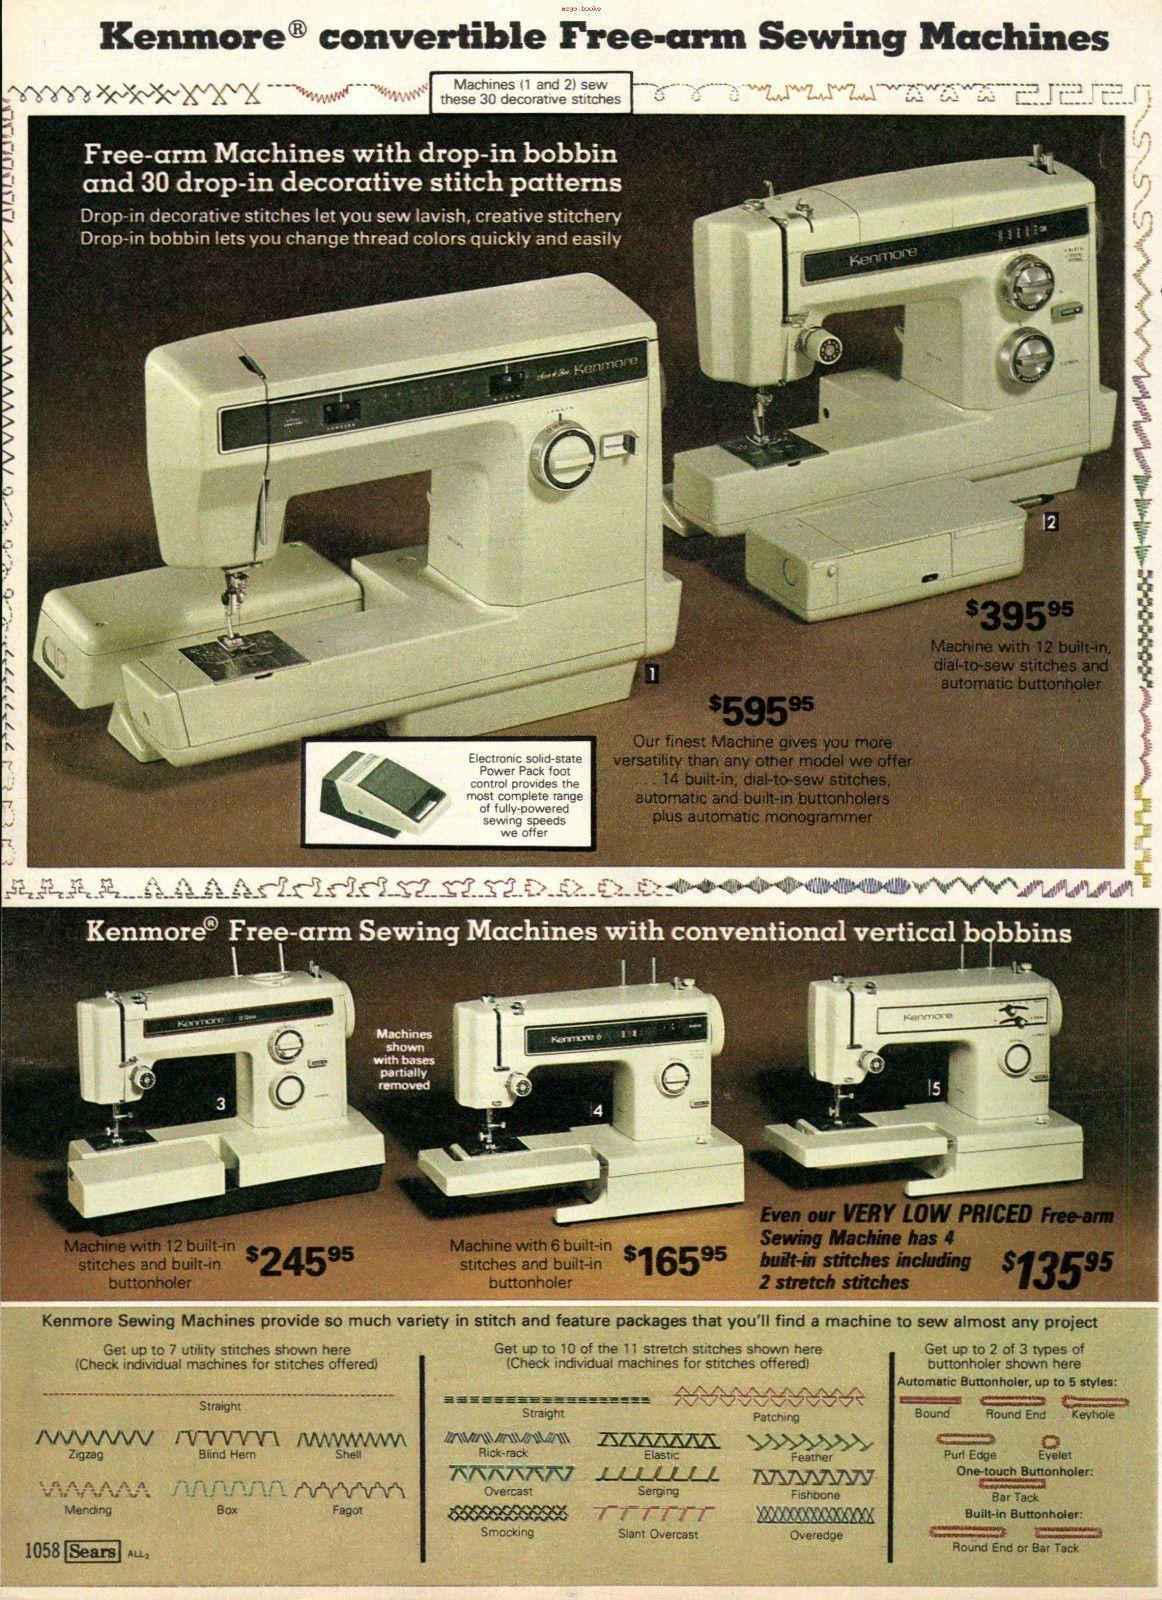 1980 Singer Sewing Machine : singer, sewing, machine, Symaskiner/Sewing, Machine